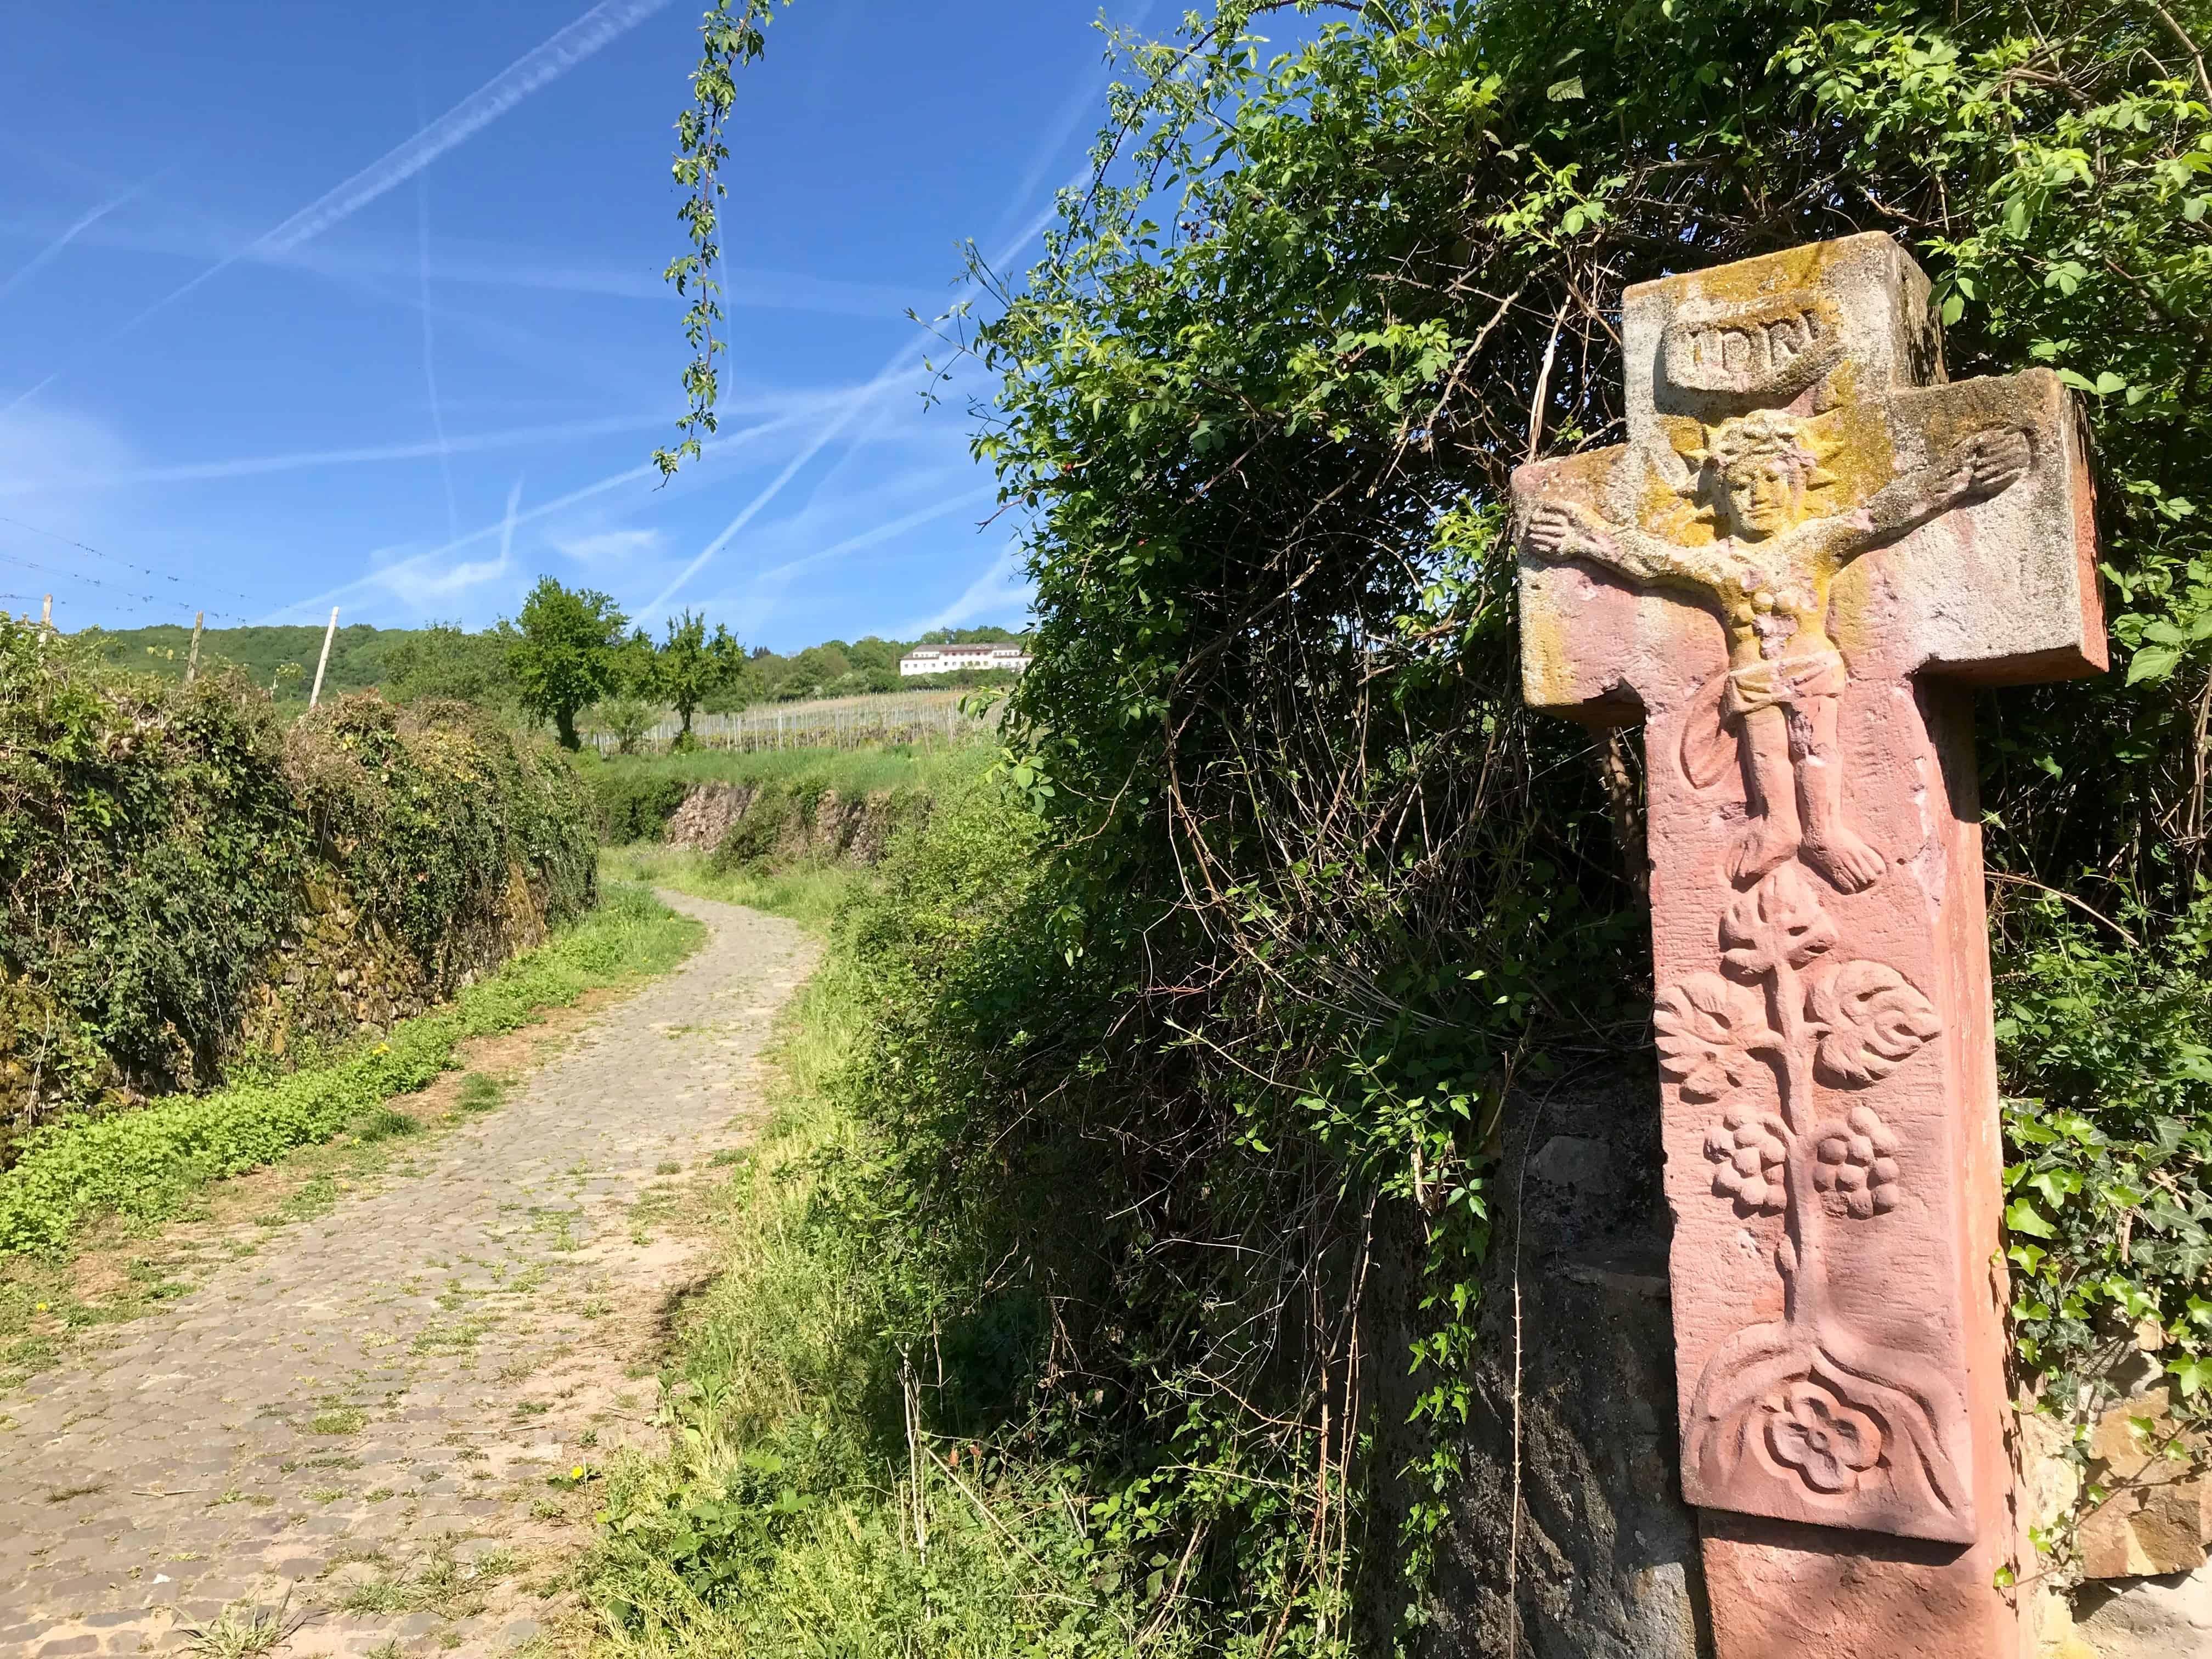 Rüdesheimer Hildegardweg, Wanderweg, Wegführung, Kreuz, Weinberge, Natur, blauer Himmel